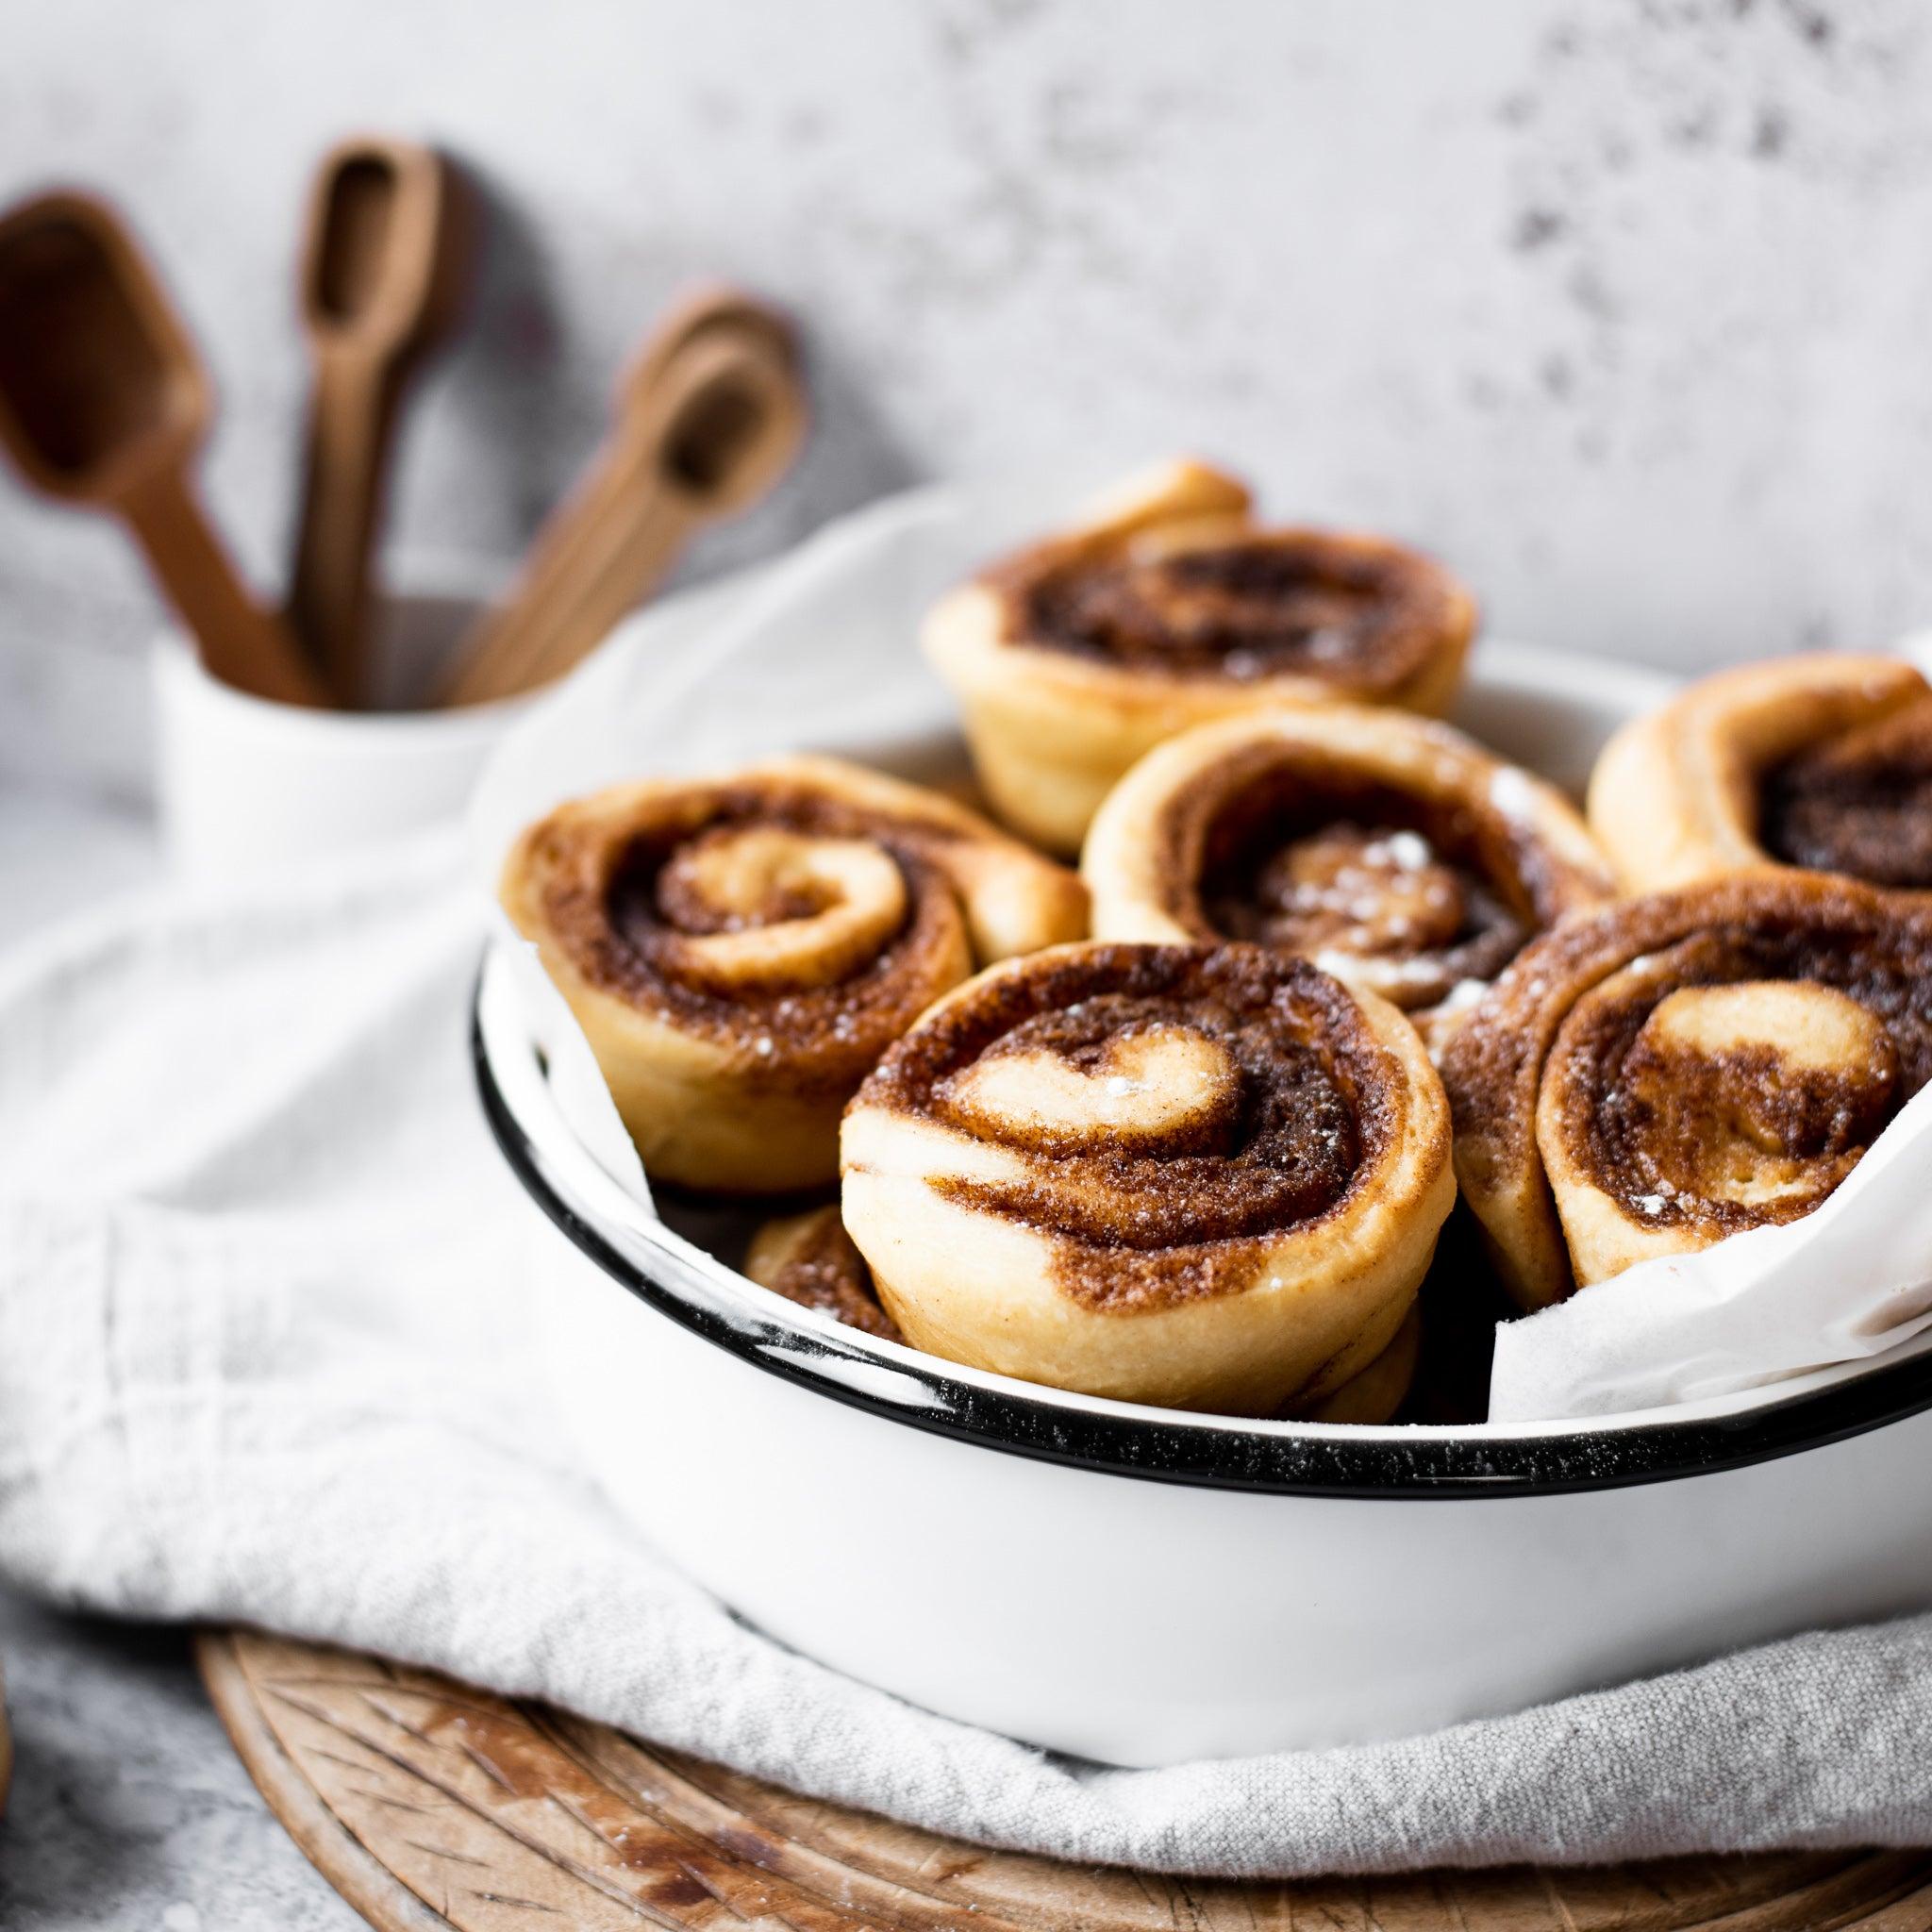 Allinsons-Cinnamon-Rolls-1-1-Baking-Mad-2.jpg